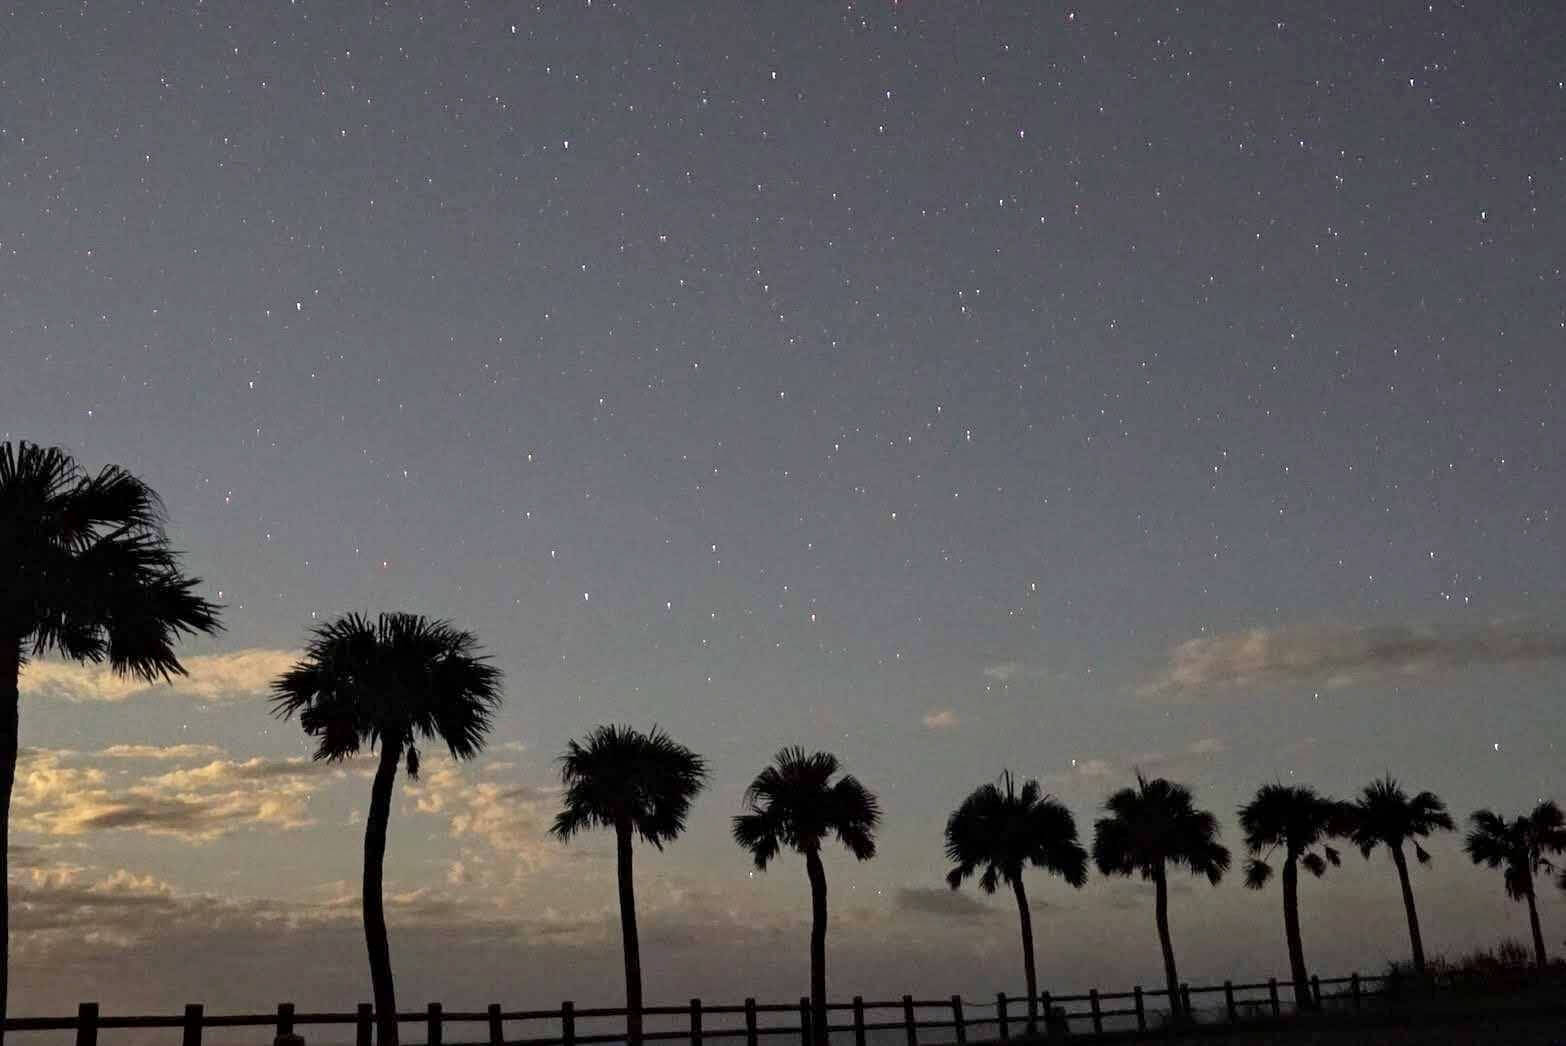 奄美大島の星空